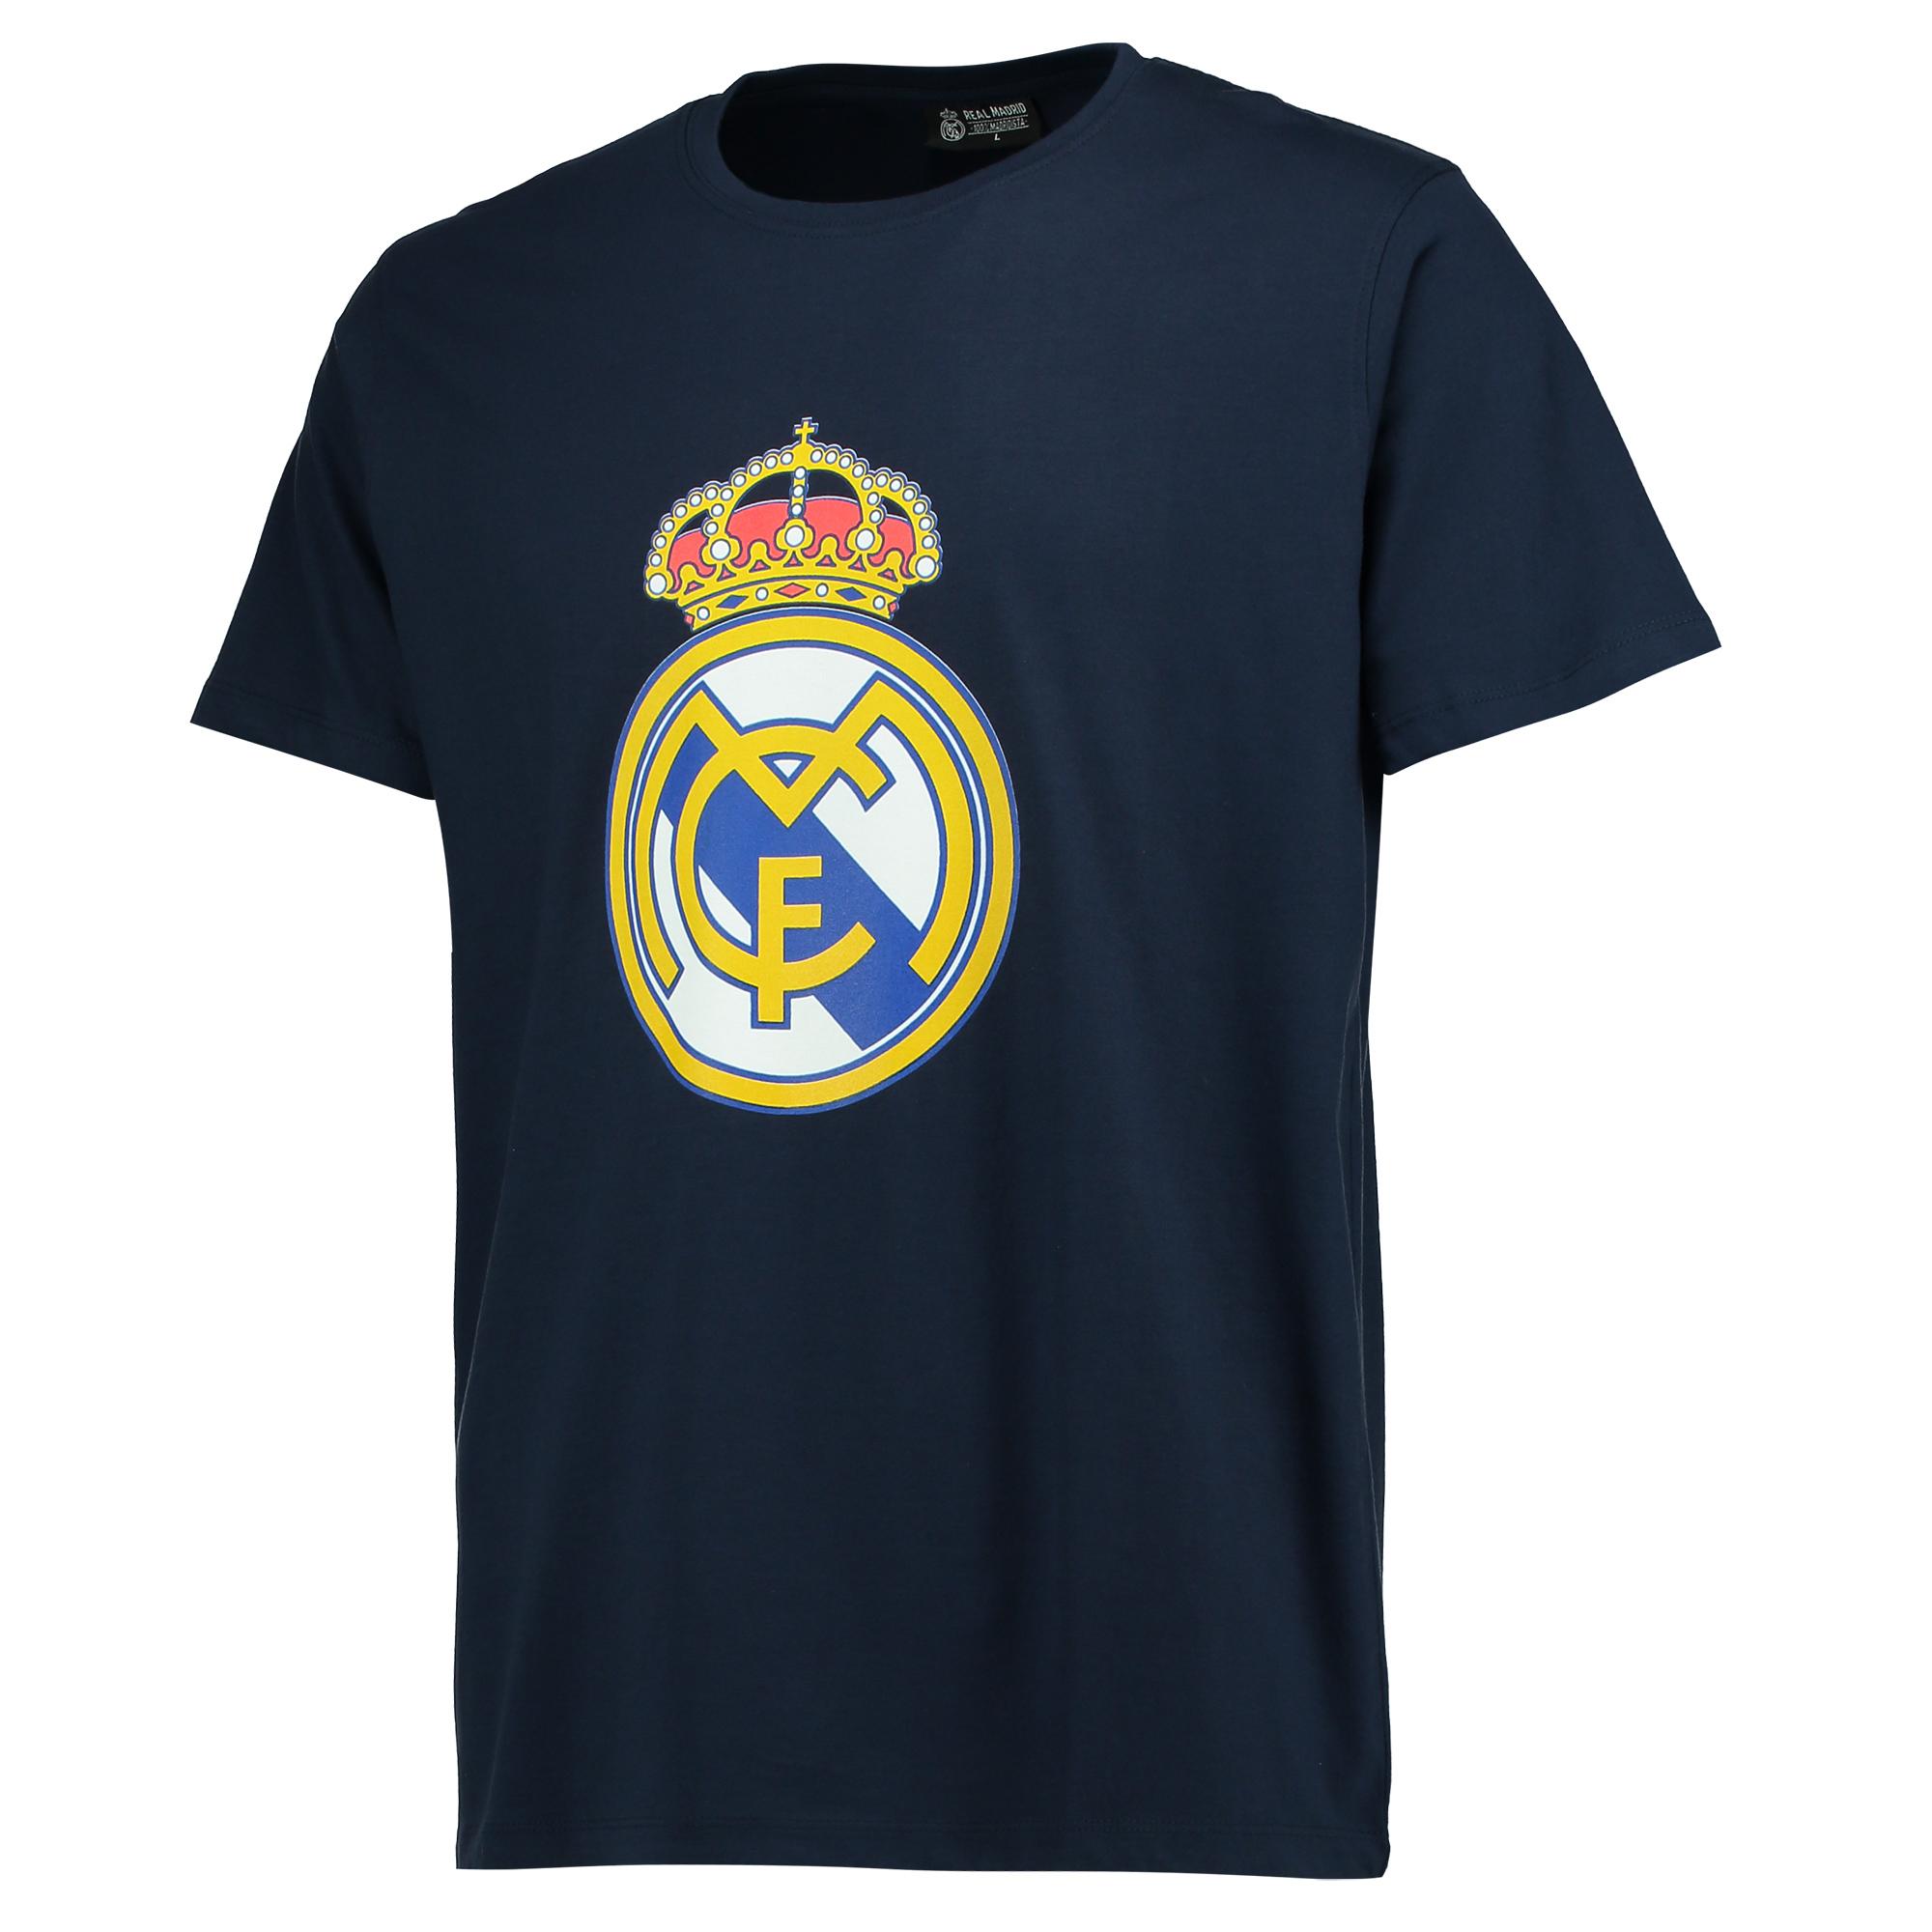 Tee-shirt à écusson Real Madrid- Bleu marine- Homme